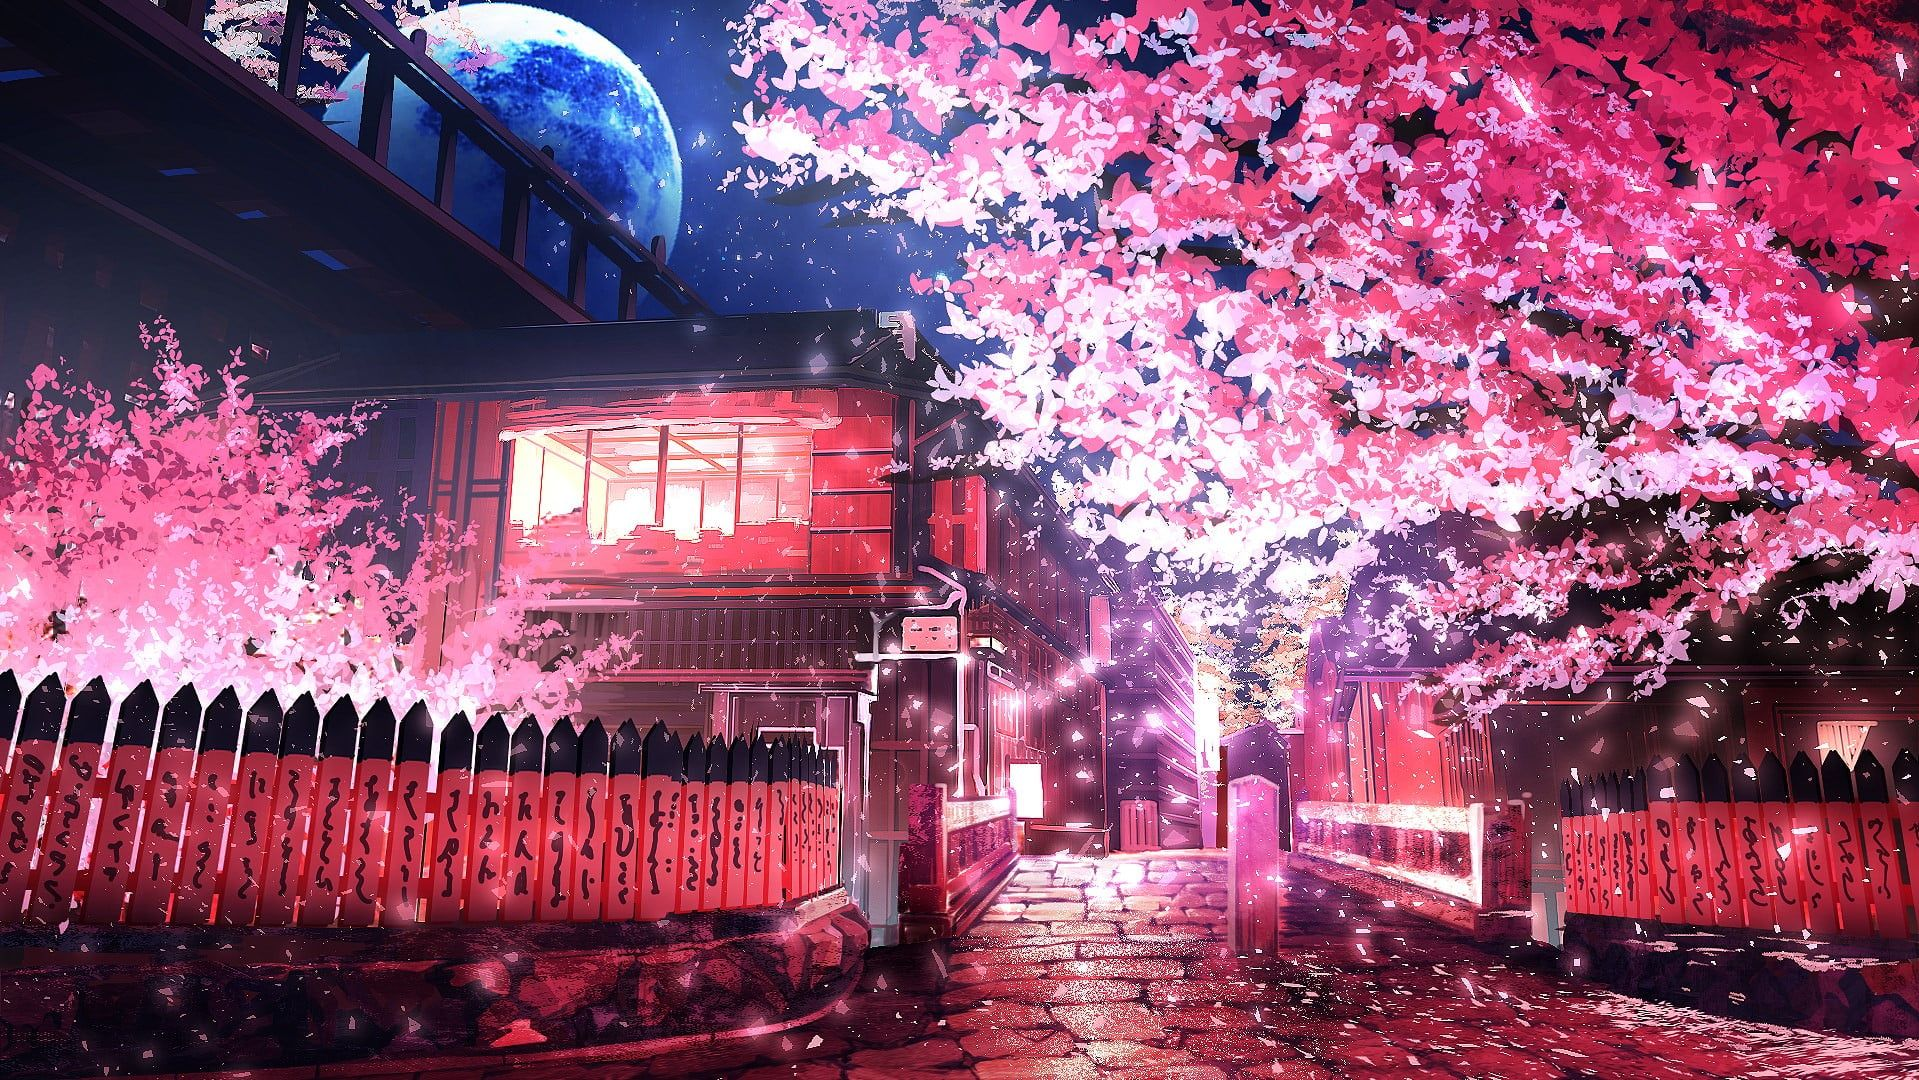 Pink Leafed Tree Anime Sakura Tree Road 720p Wallpaper Hdwallpaper Desktop Scenery Wallpaper Anime Scenery Wallpaper Anime Scenery